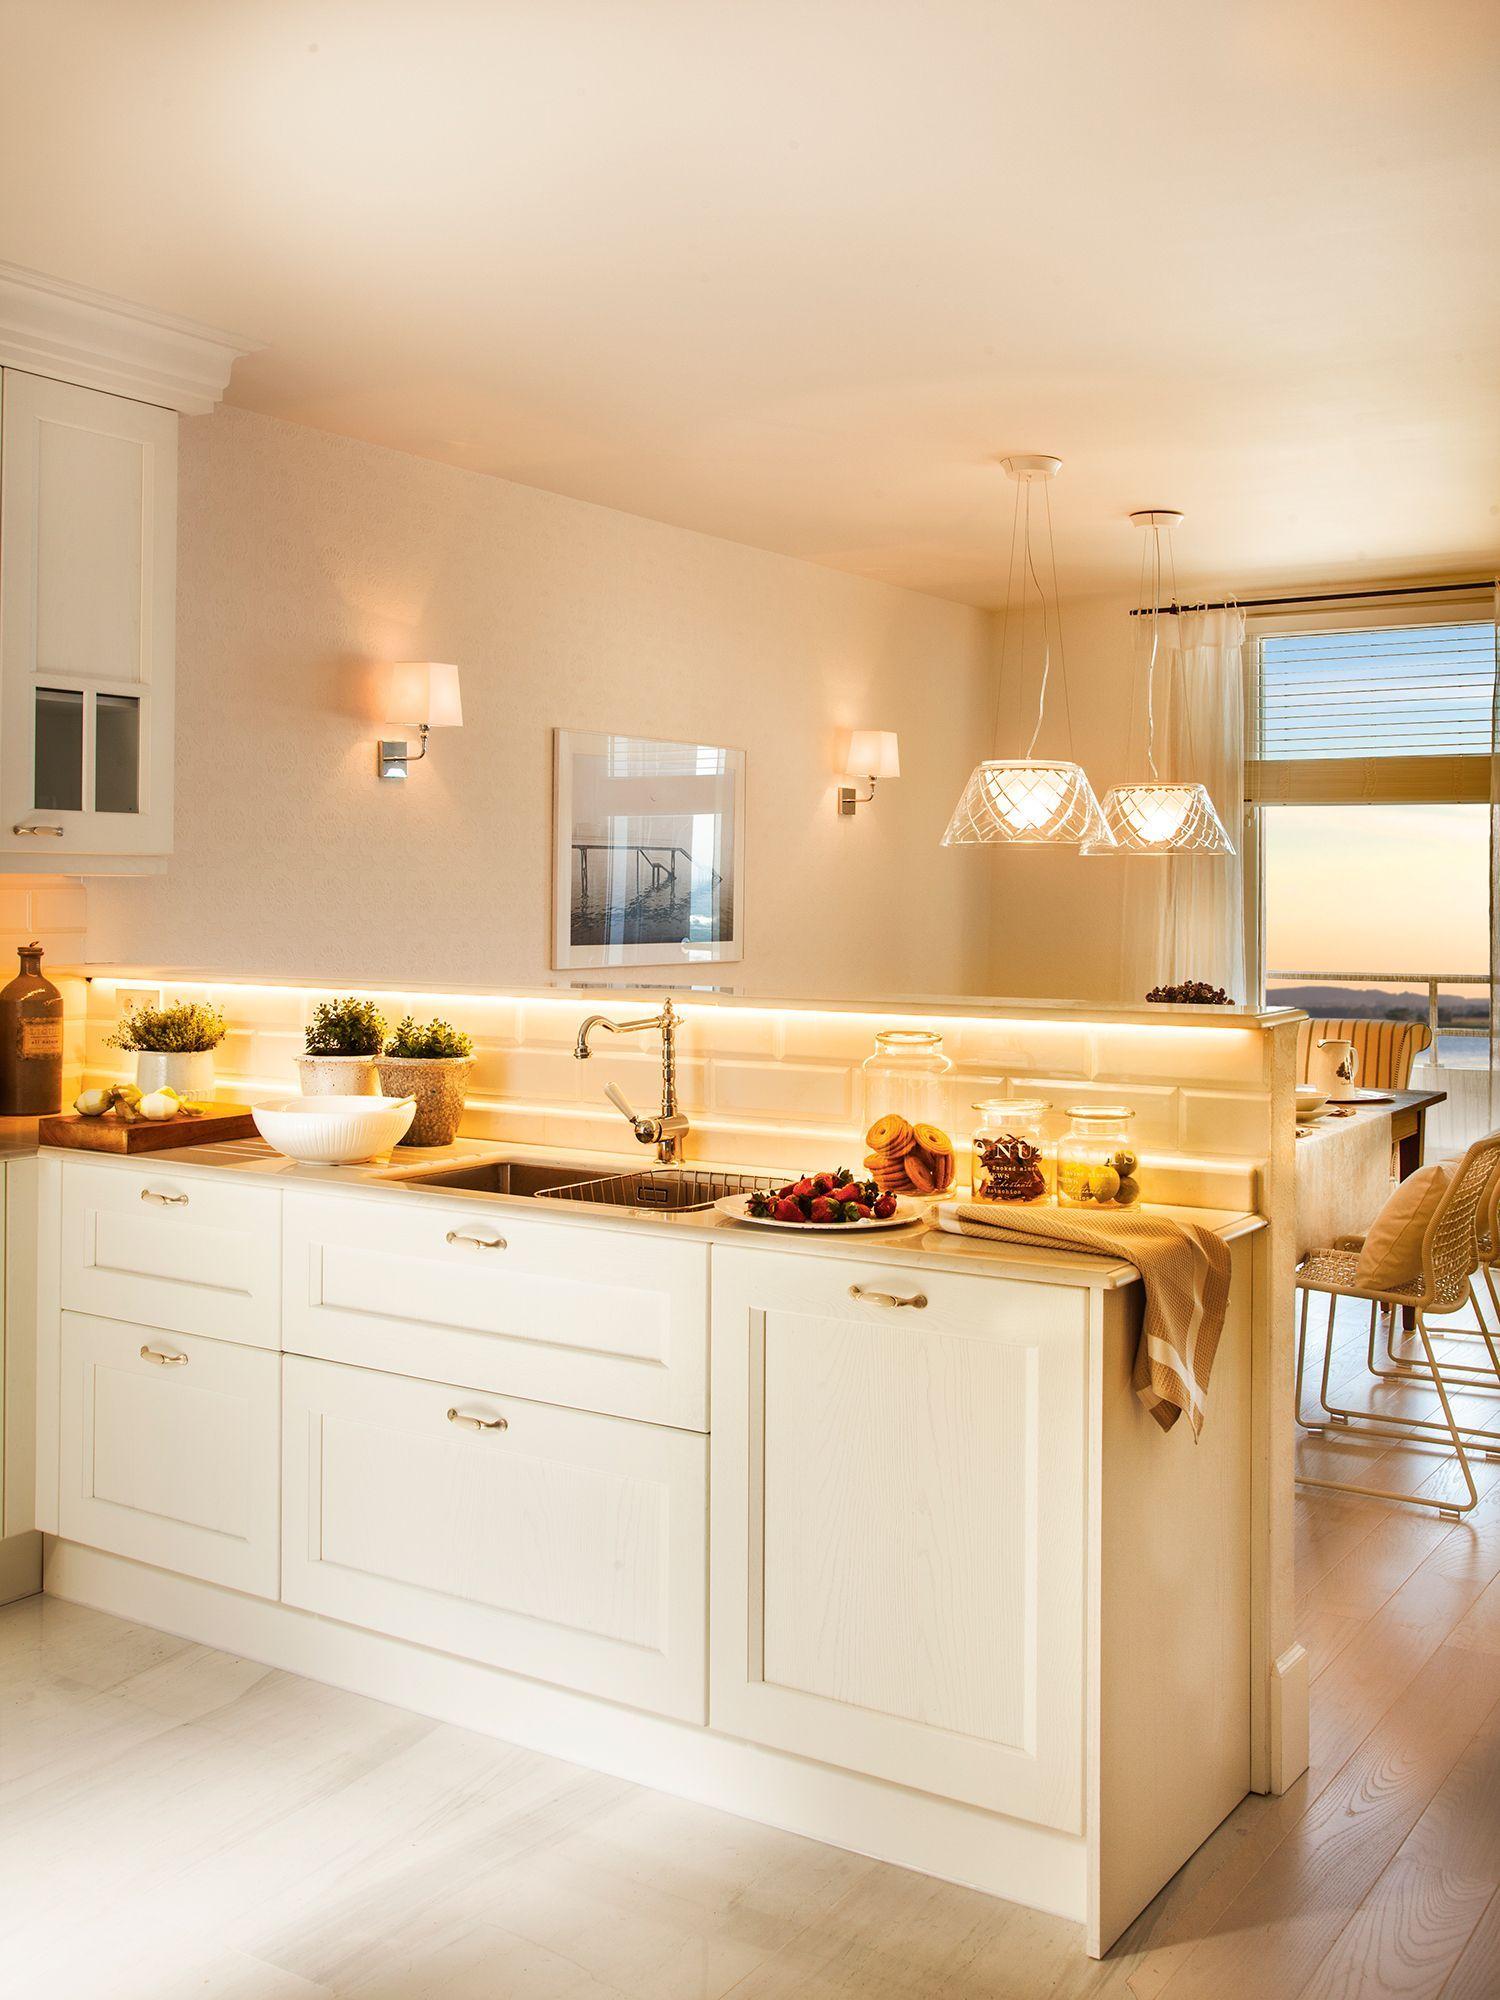 Cocina blanca contigua al office con luces encendidas_ 00411705 ...